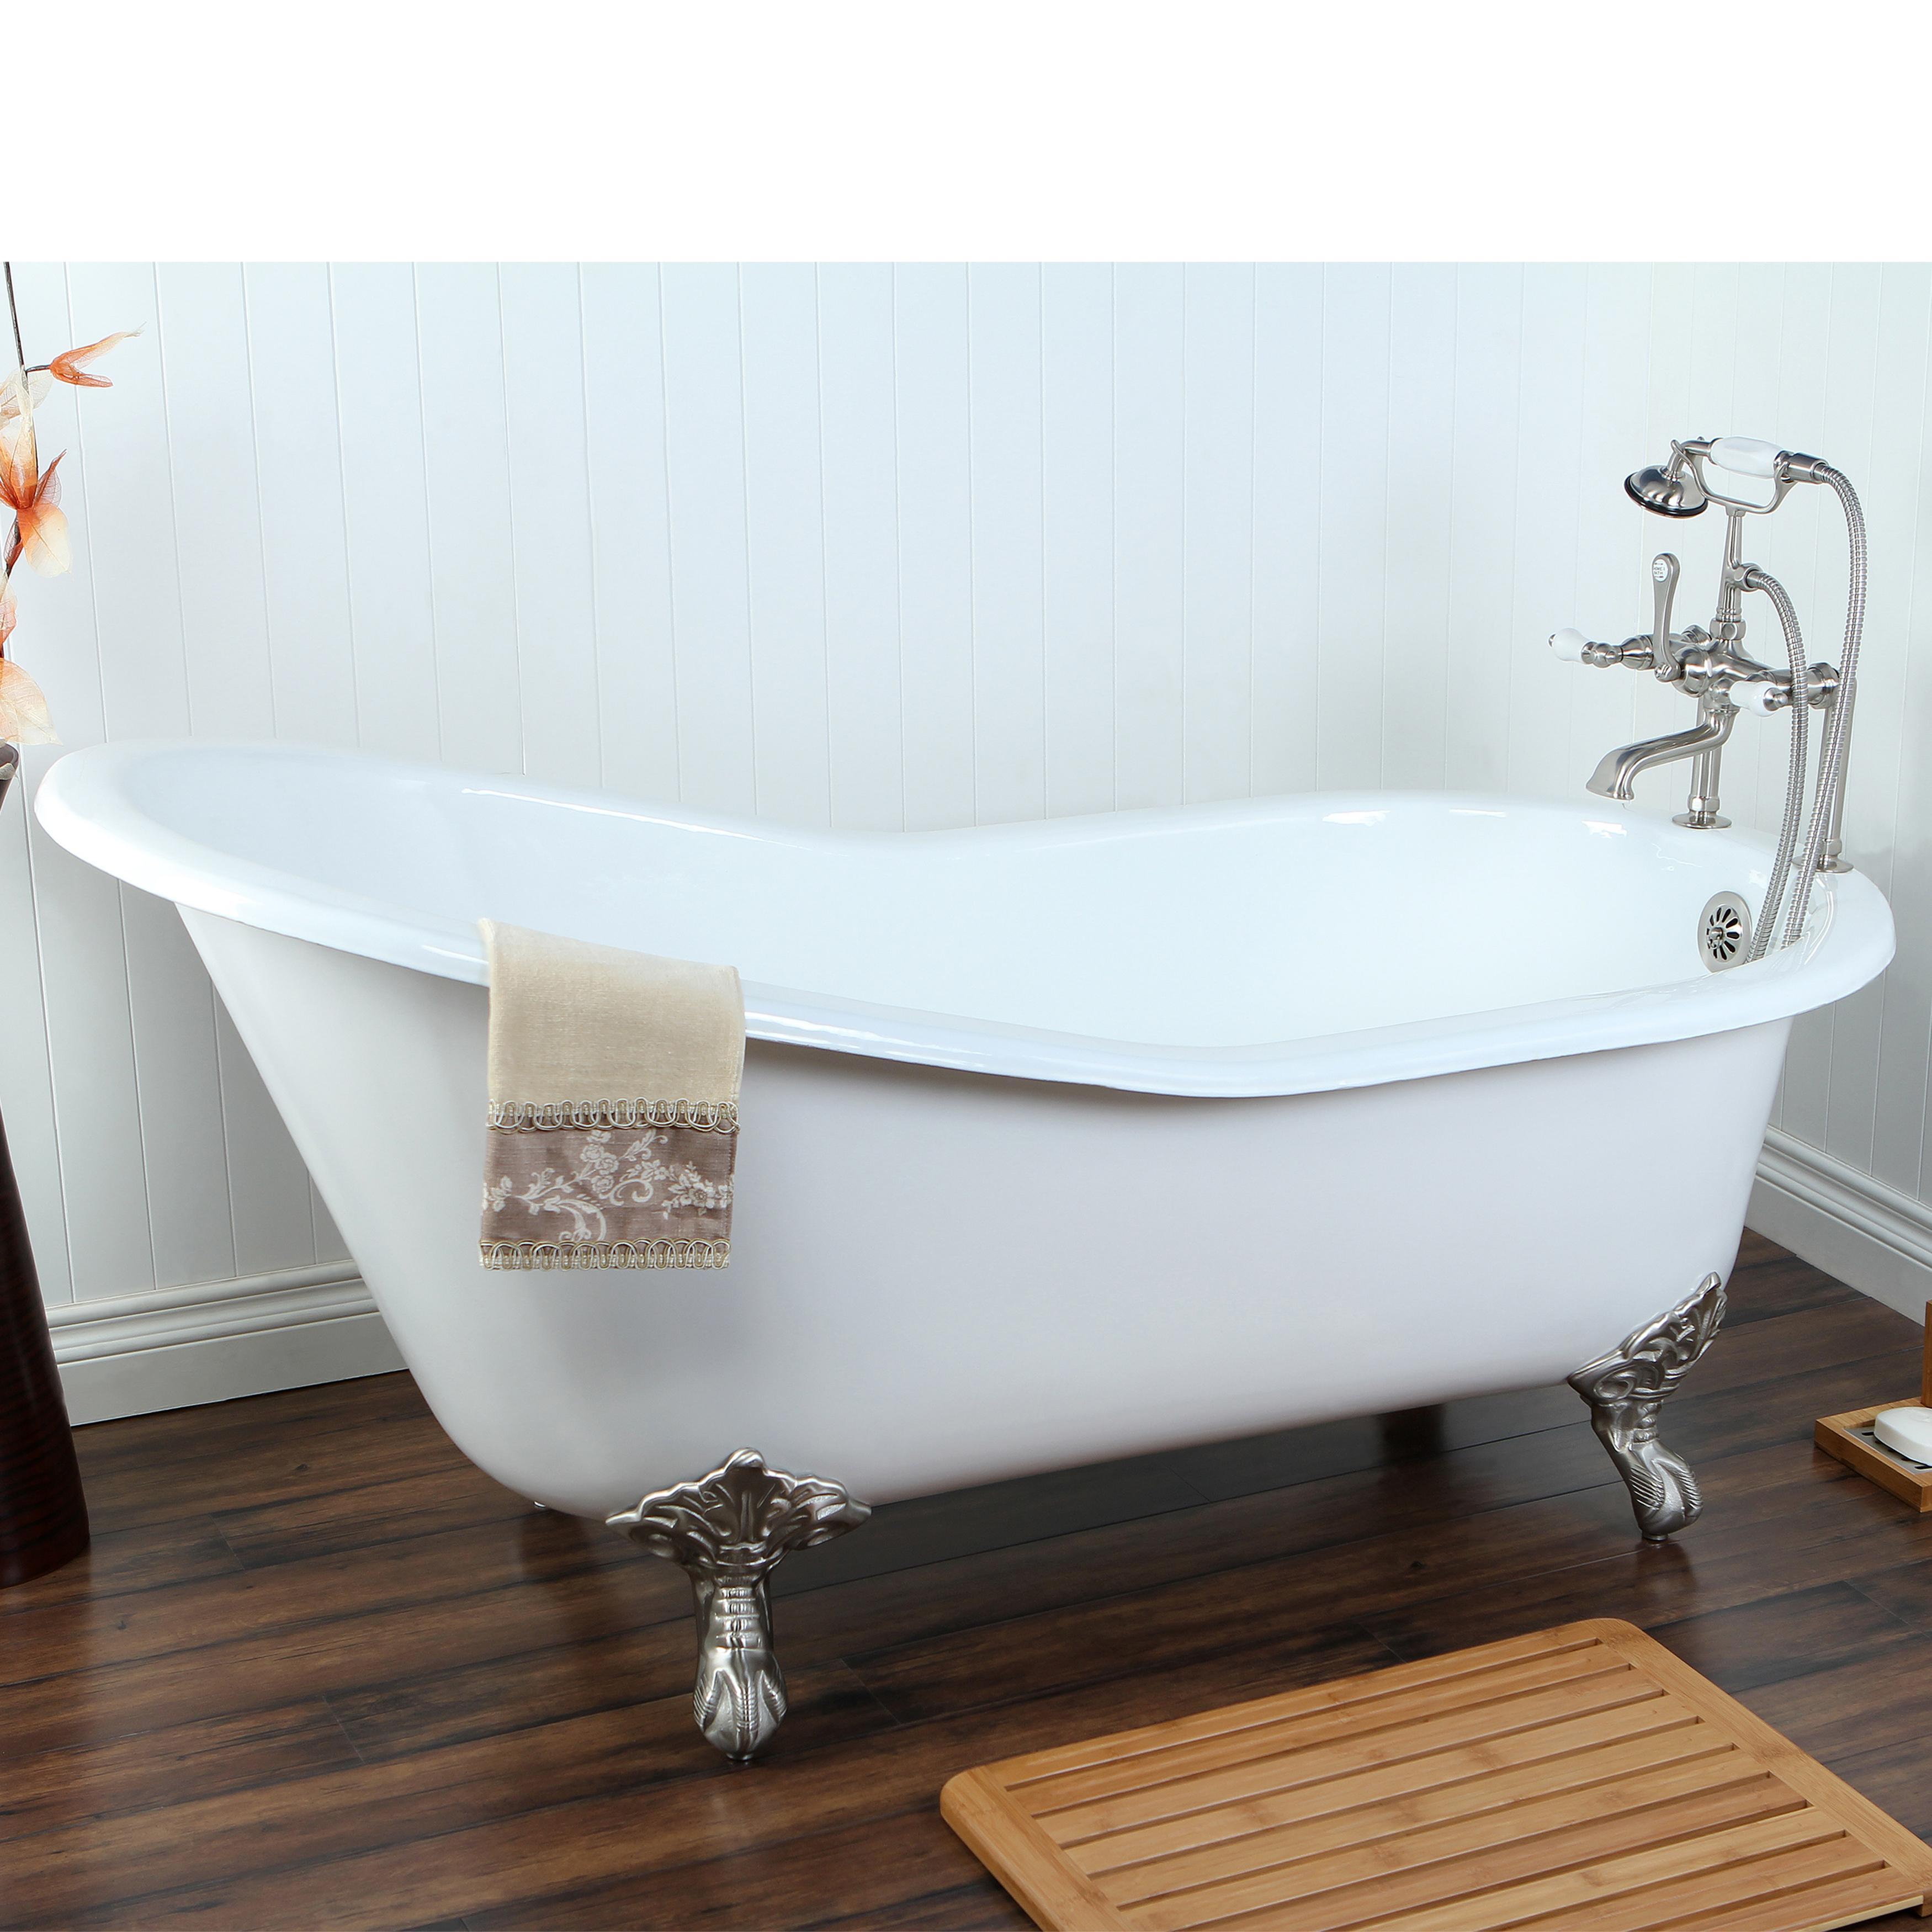 double slipper 6 ft cast iron clawfoot bathtub